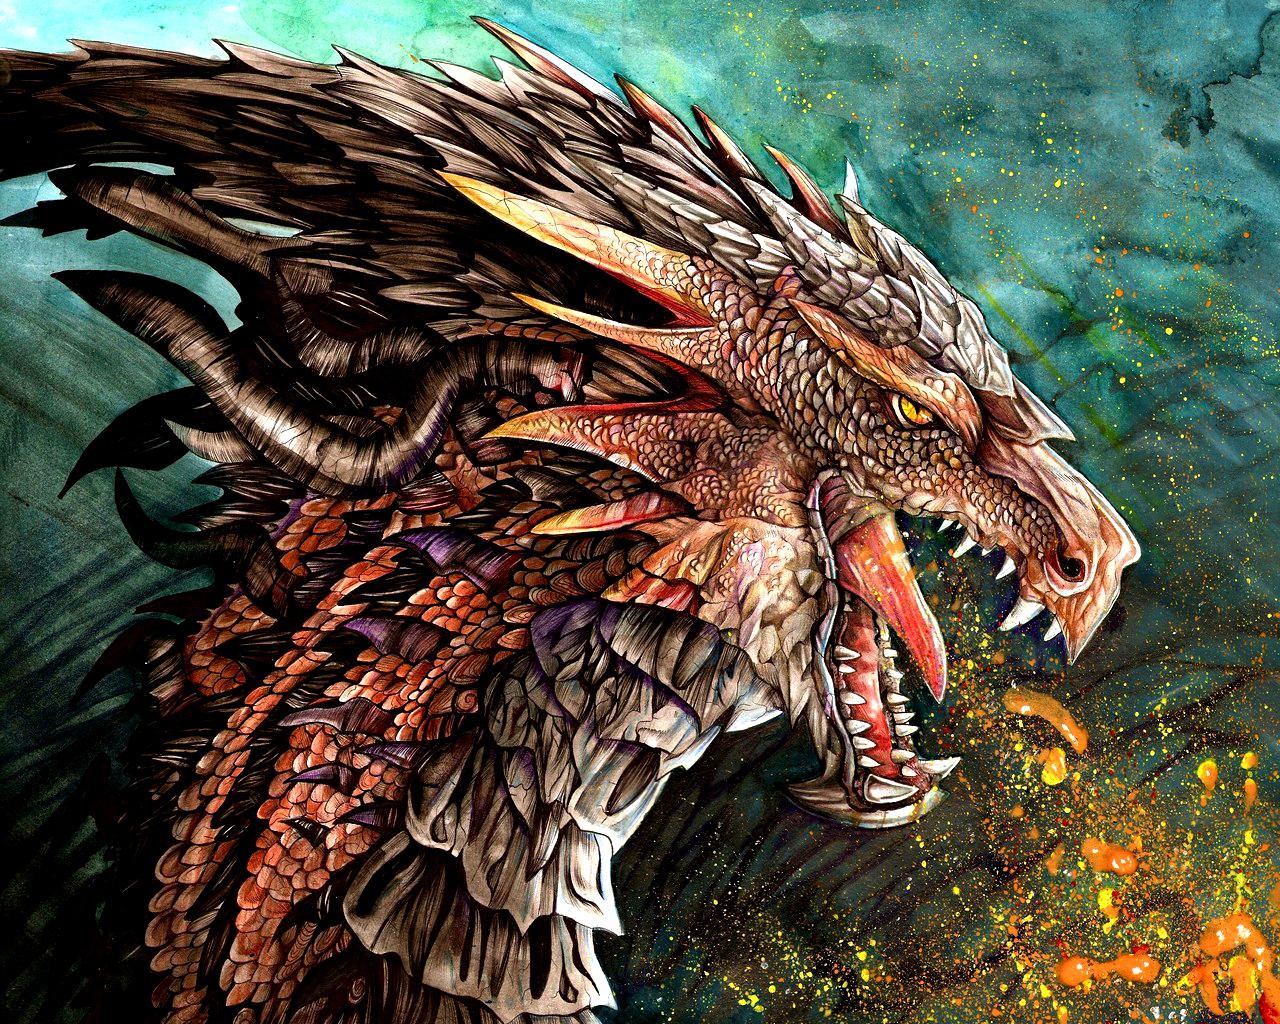 Dragon photo 47